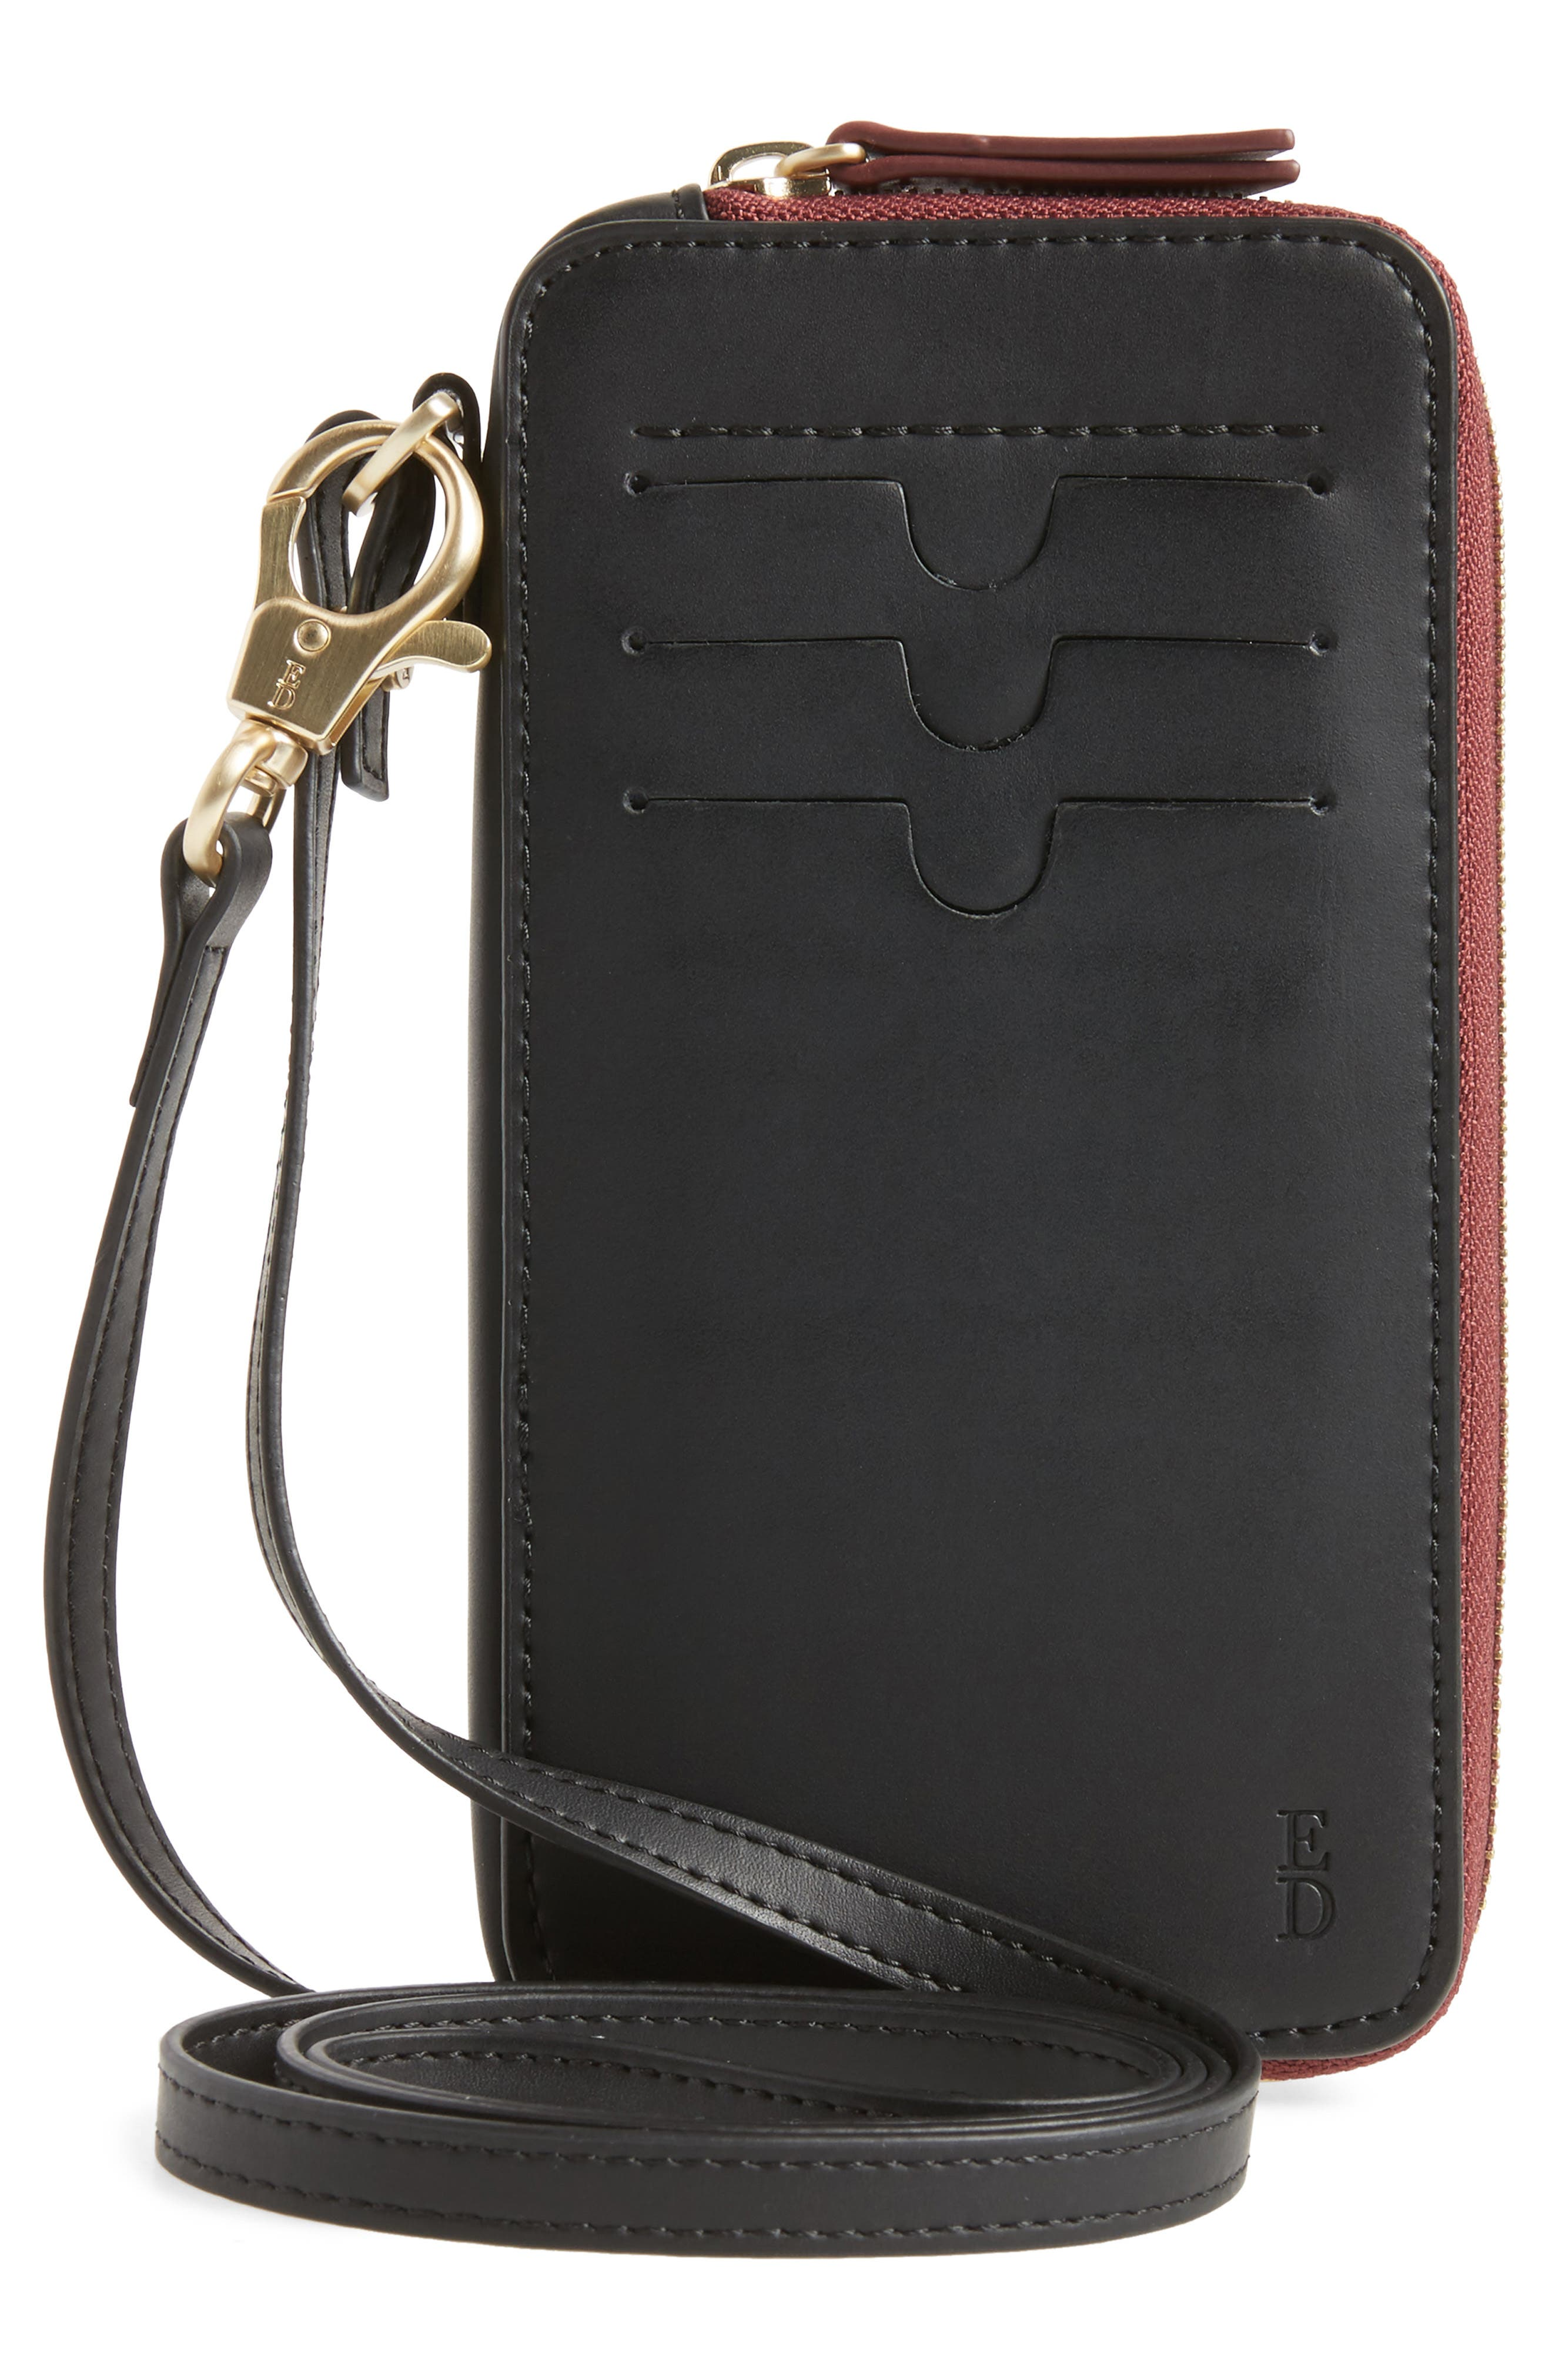 Brea Convertible Smartphone Leather Clutch,                             Alternate thumbnail 3, color,                             001